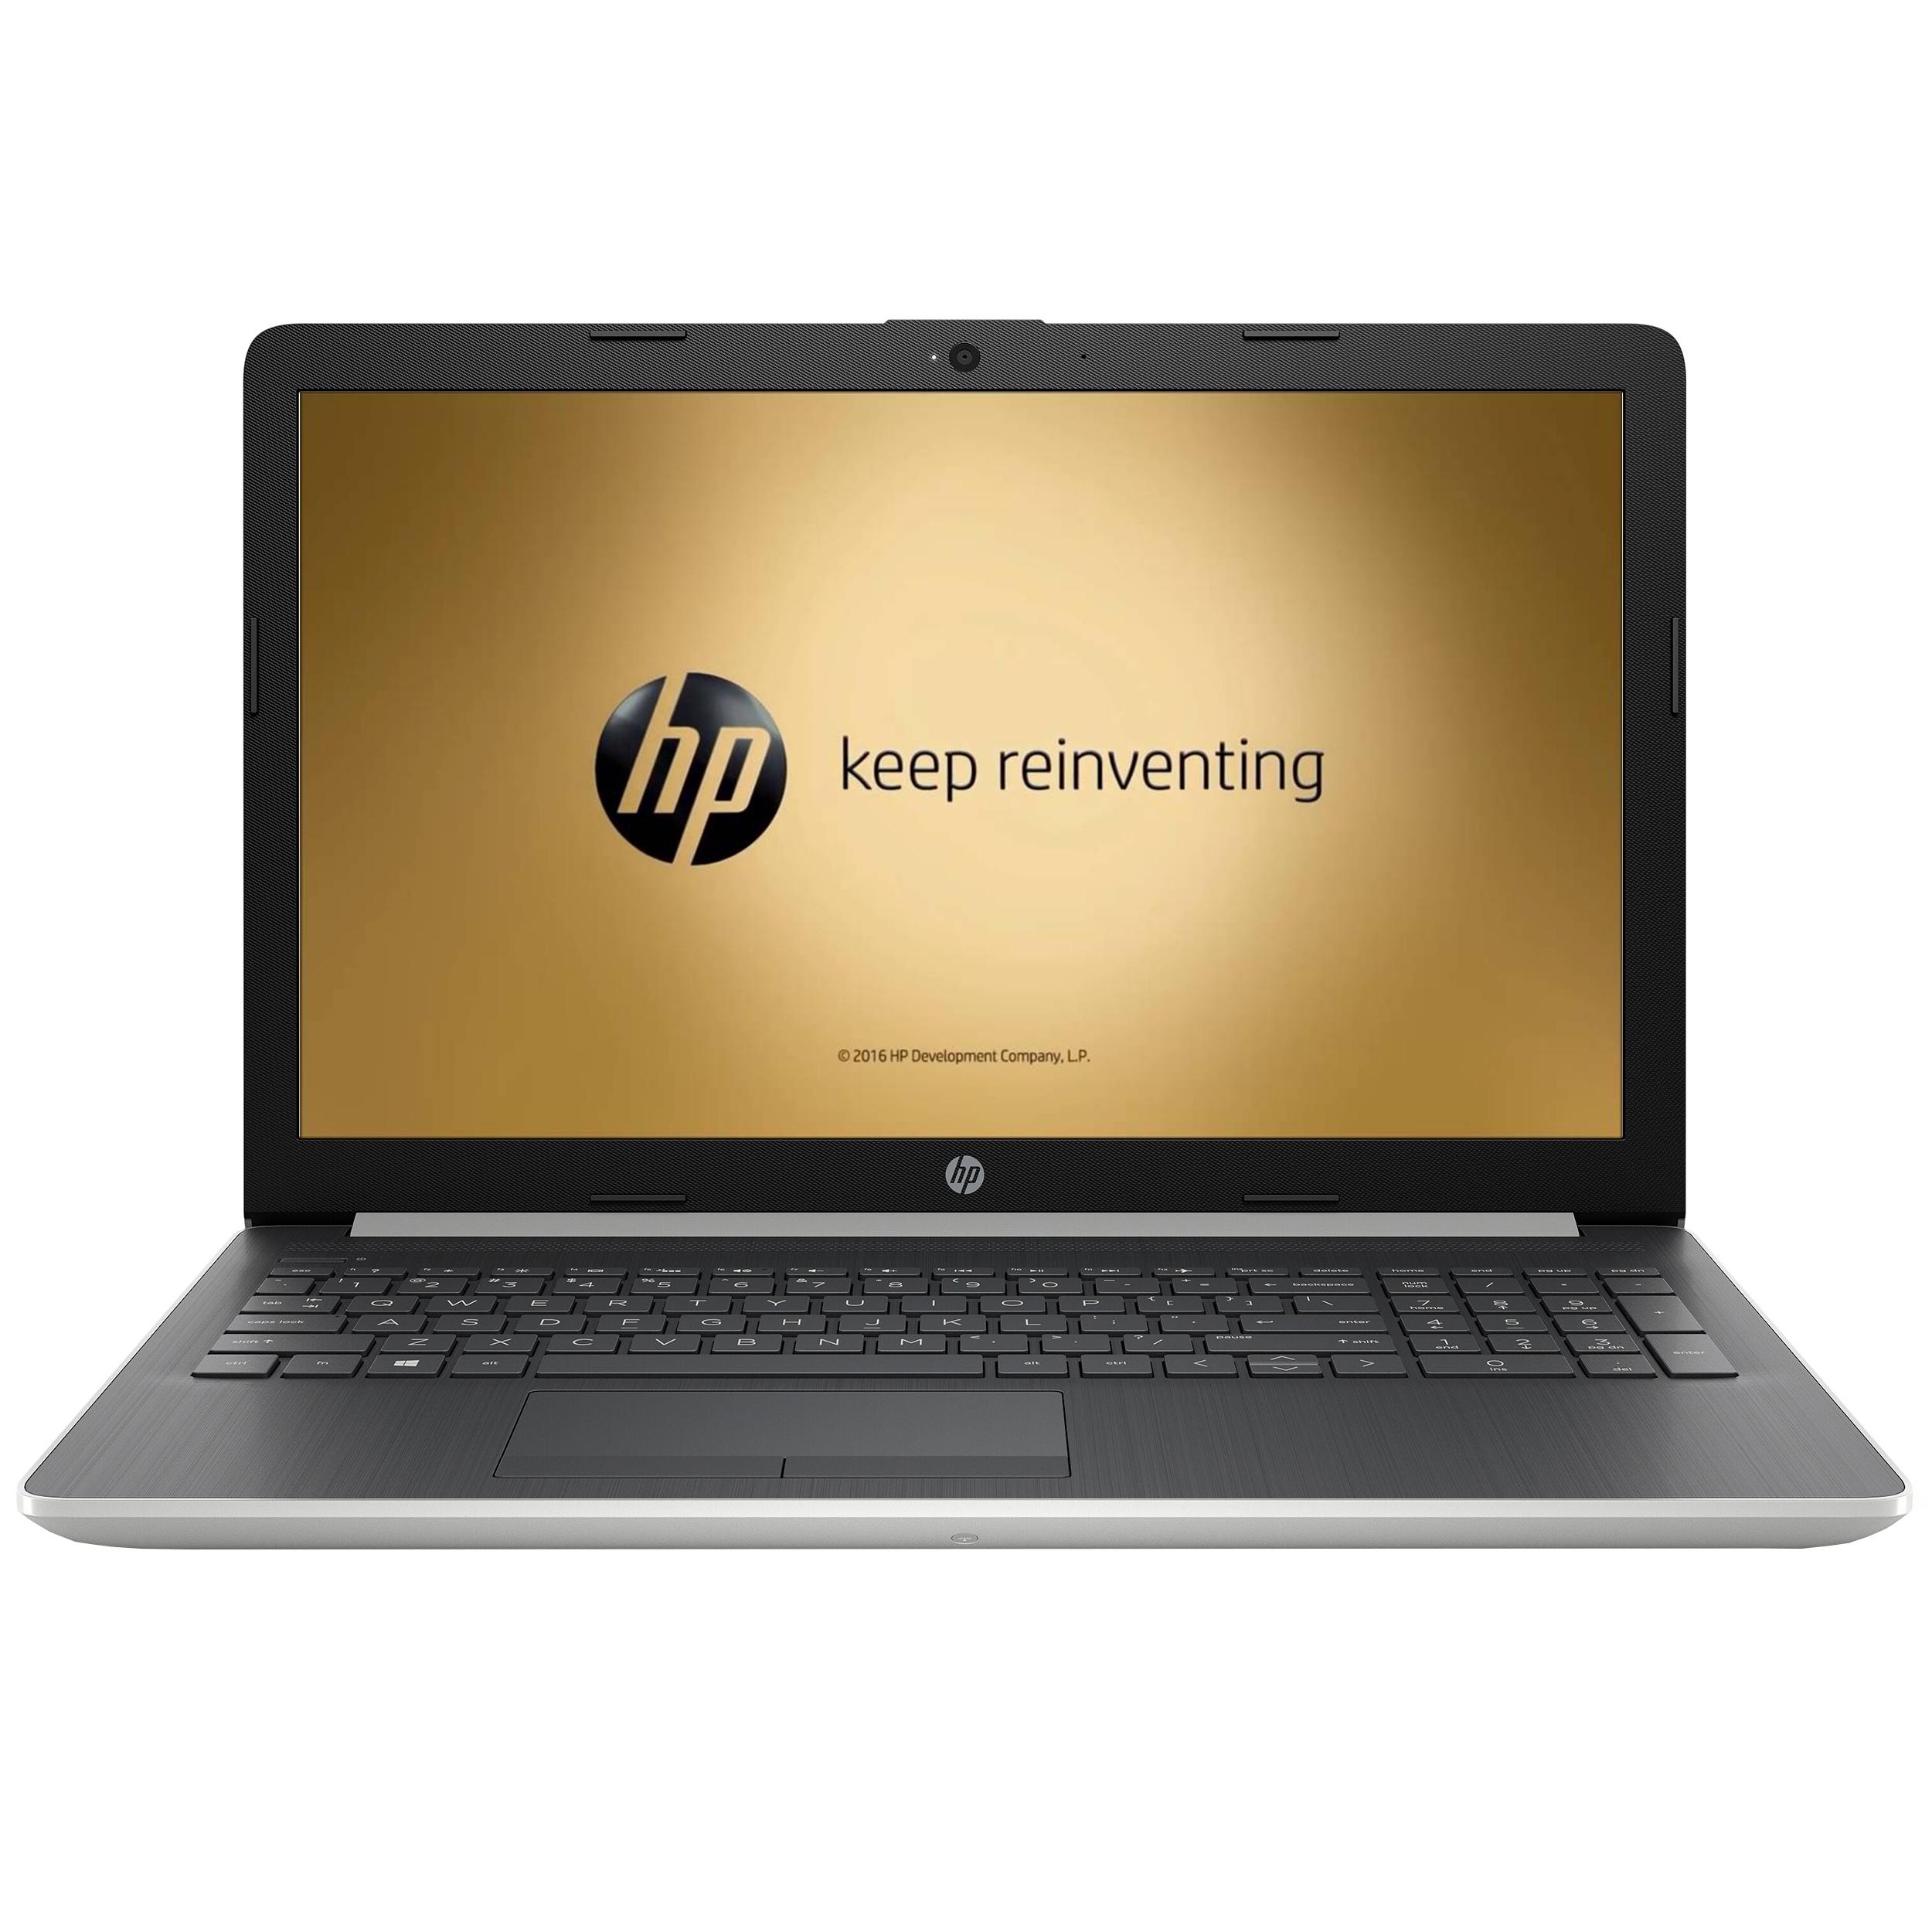 لپ تاپ 15 اینچی اچ پی مدل DA2211-A